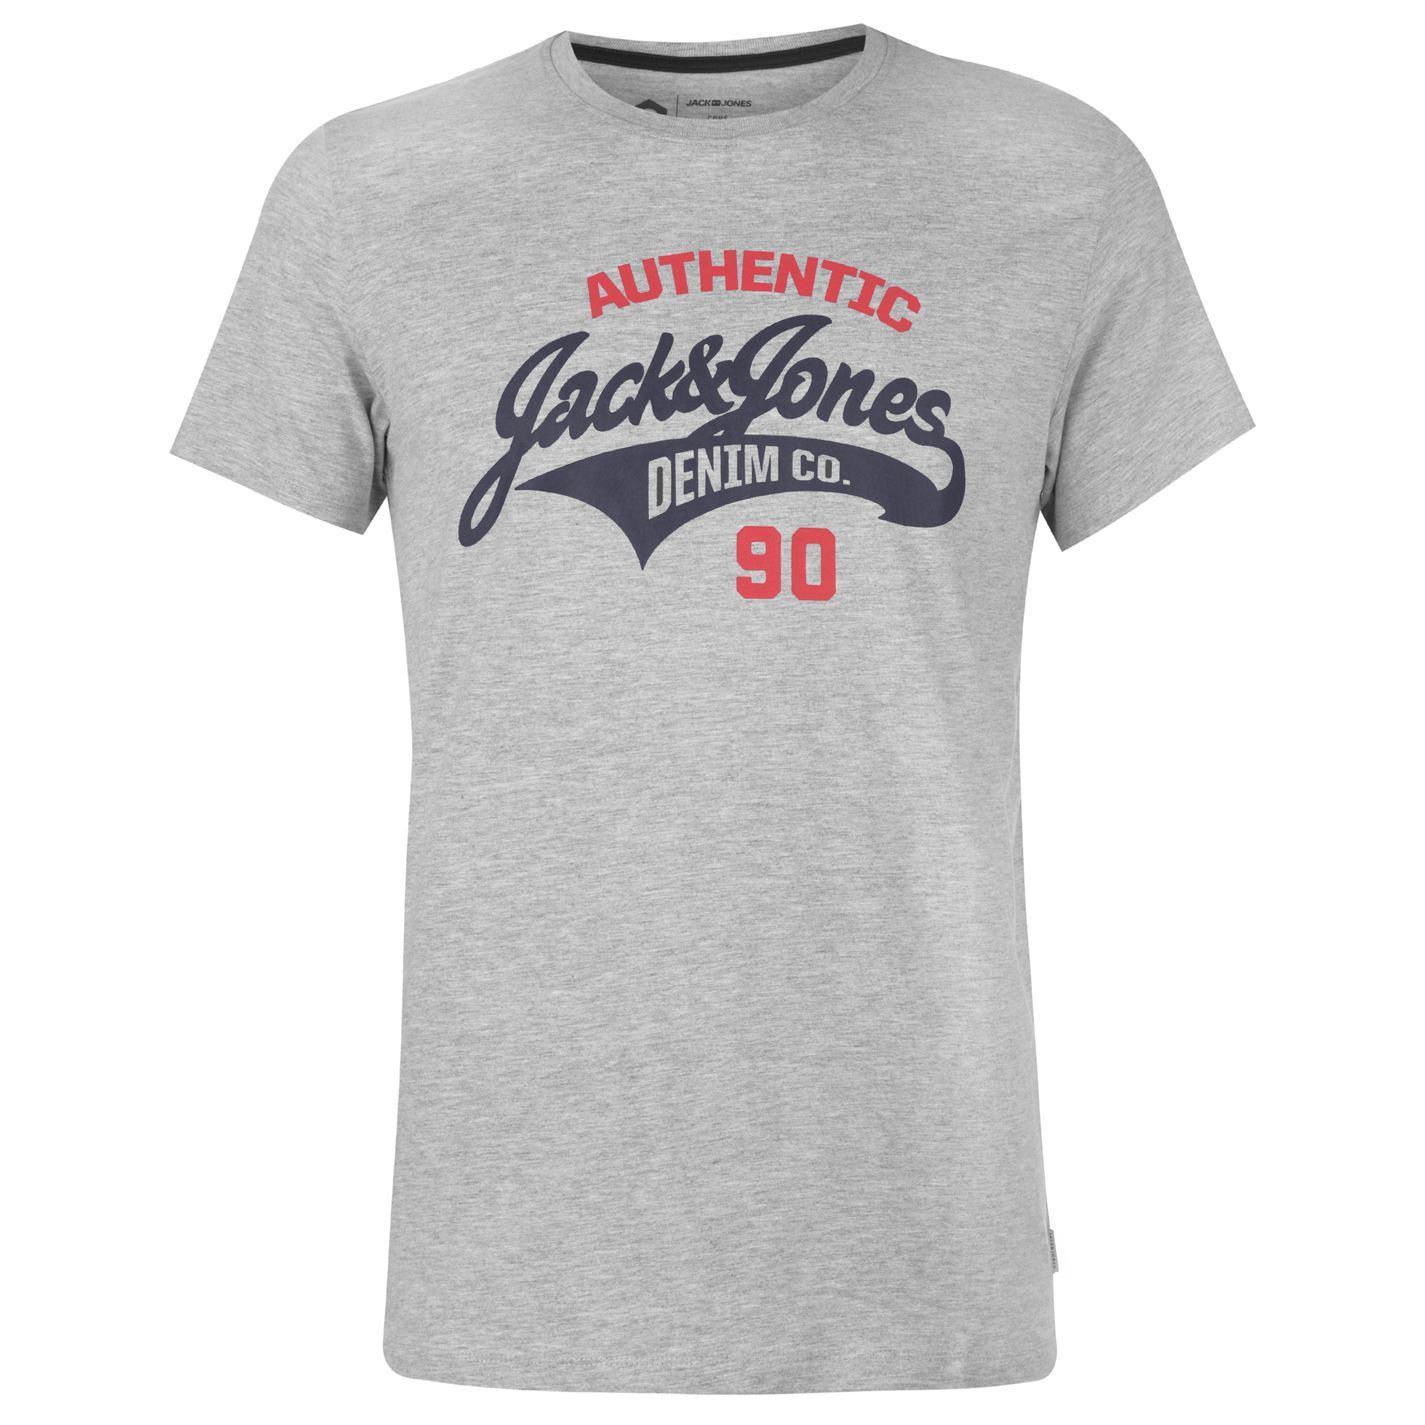 Jack-and-Jones-Core-Heritage-Logo-T-Shirt-Mens-Tee-Shirt-Top thumbnail 5